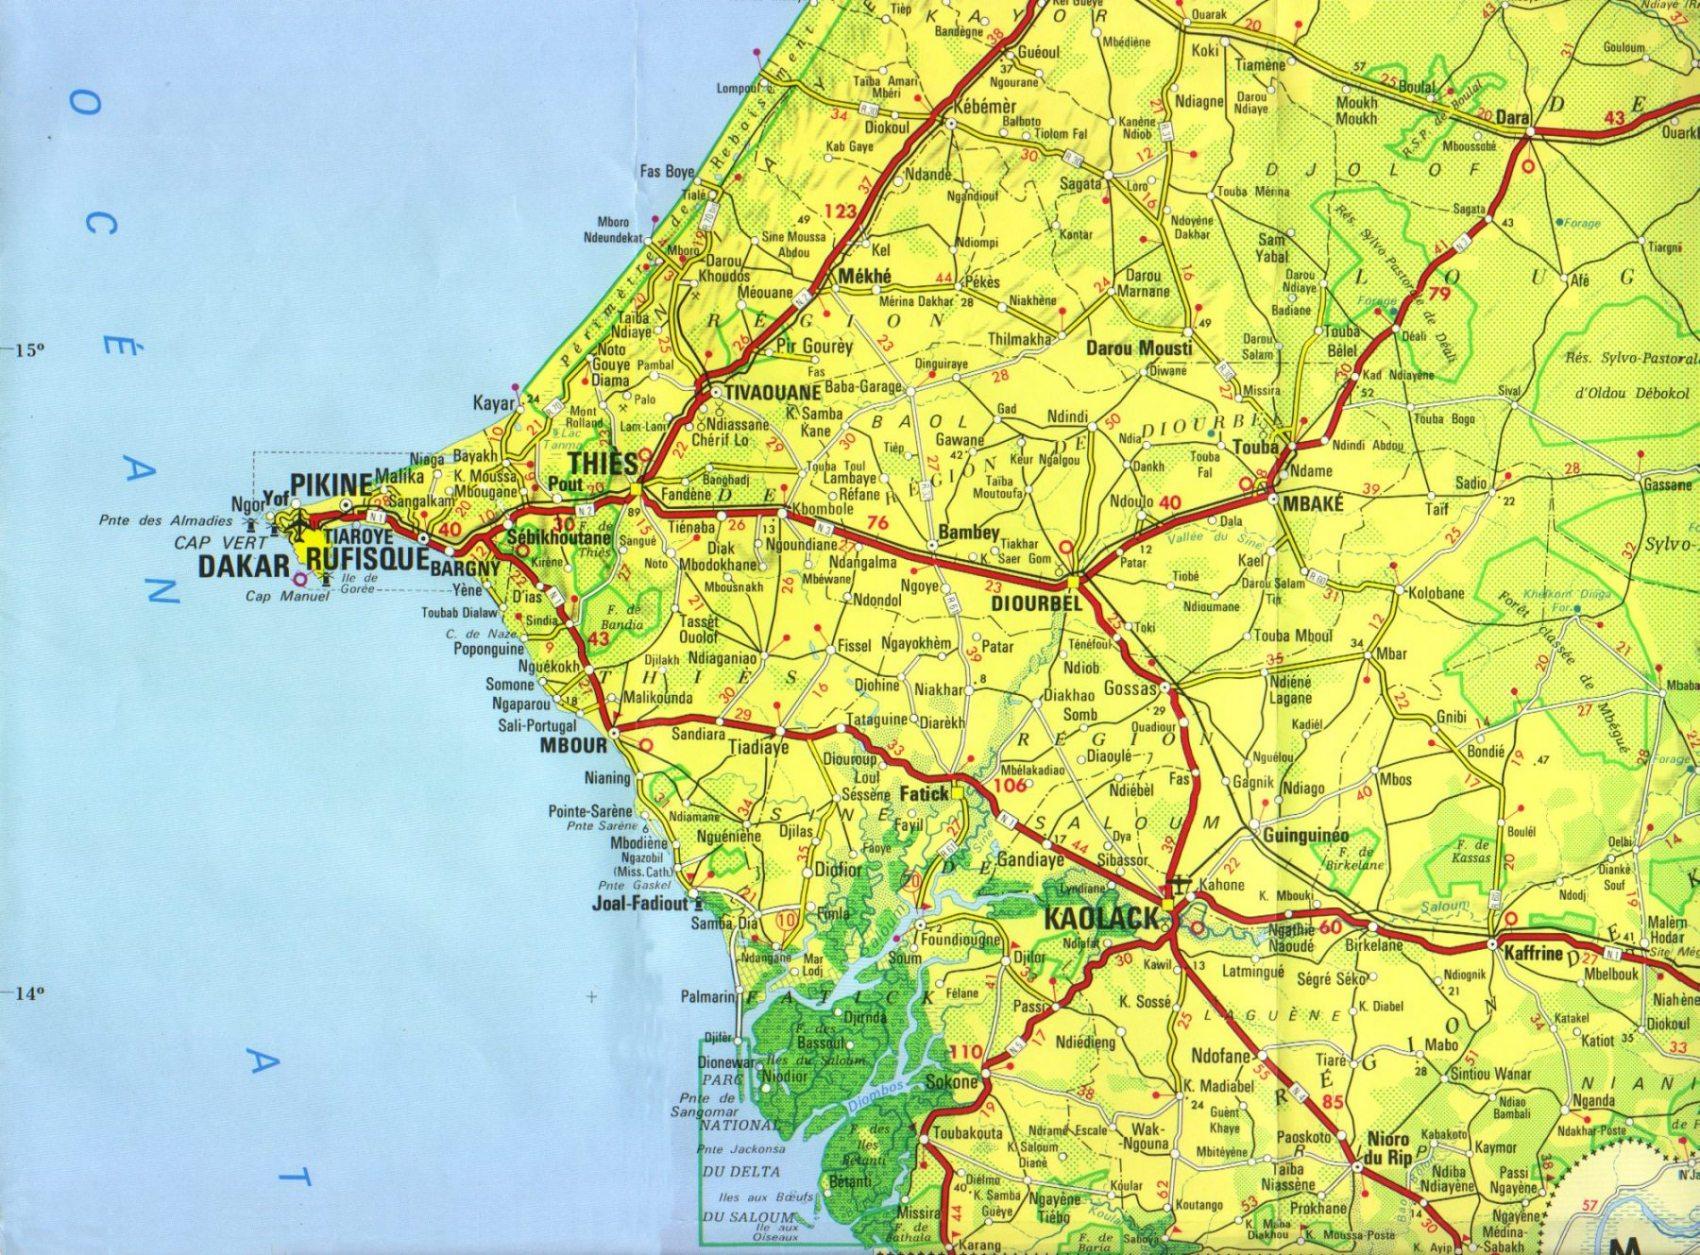 Carte Senegal Cap Vert.Les Differentes Regions Du Senegal